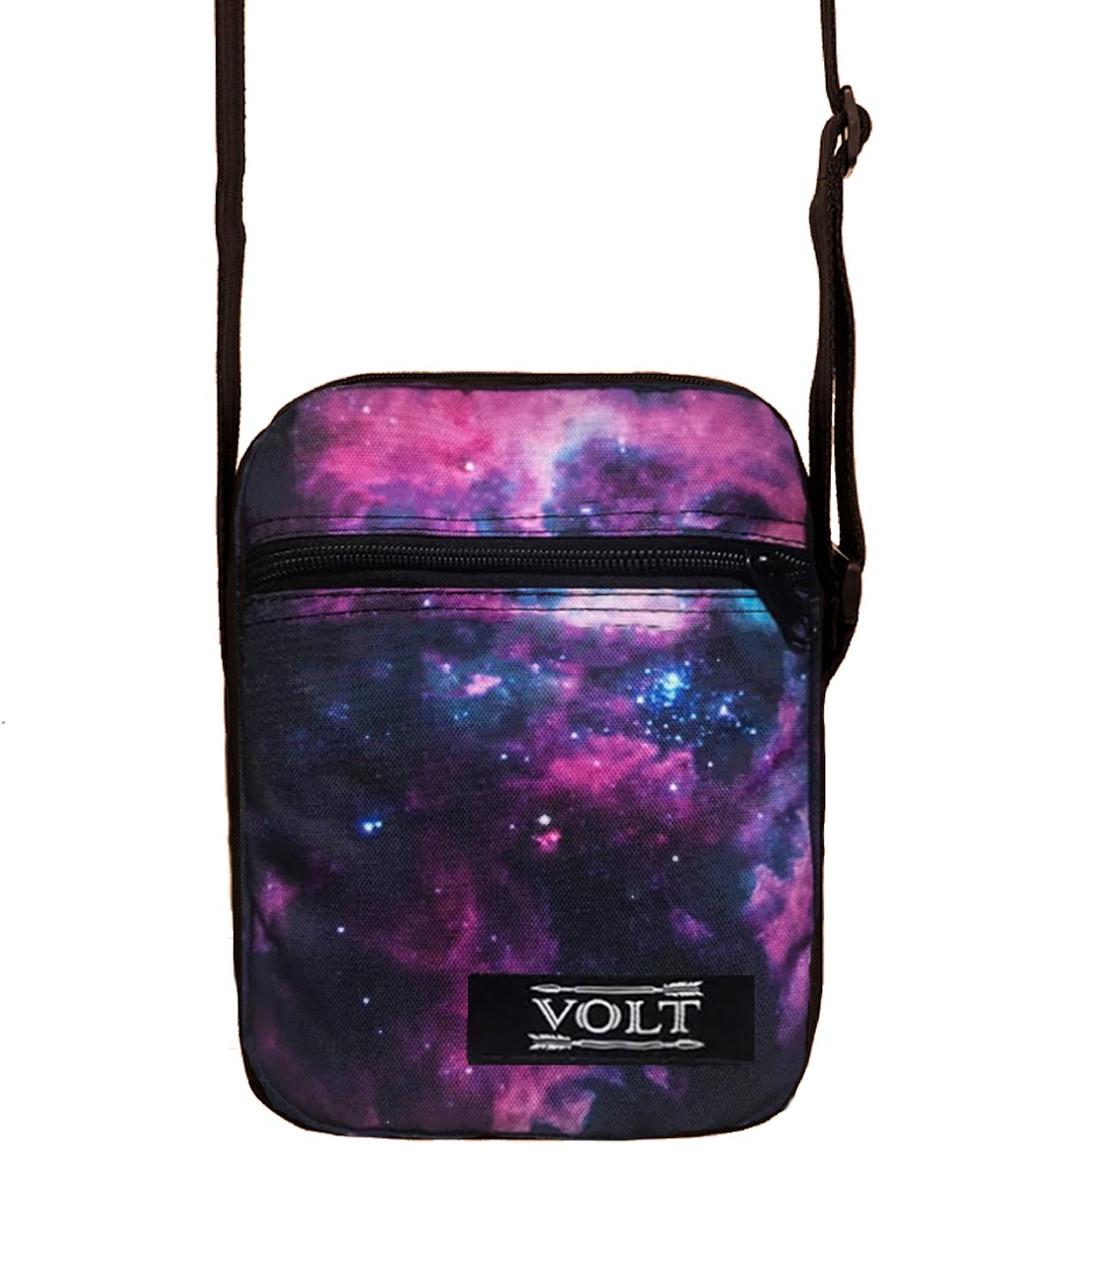 Месенджер VOLT FP Cosmos сумка через плече